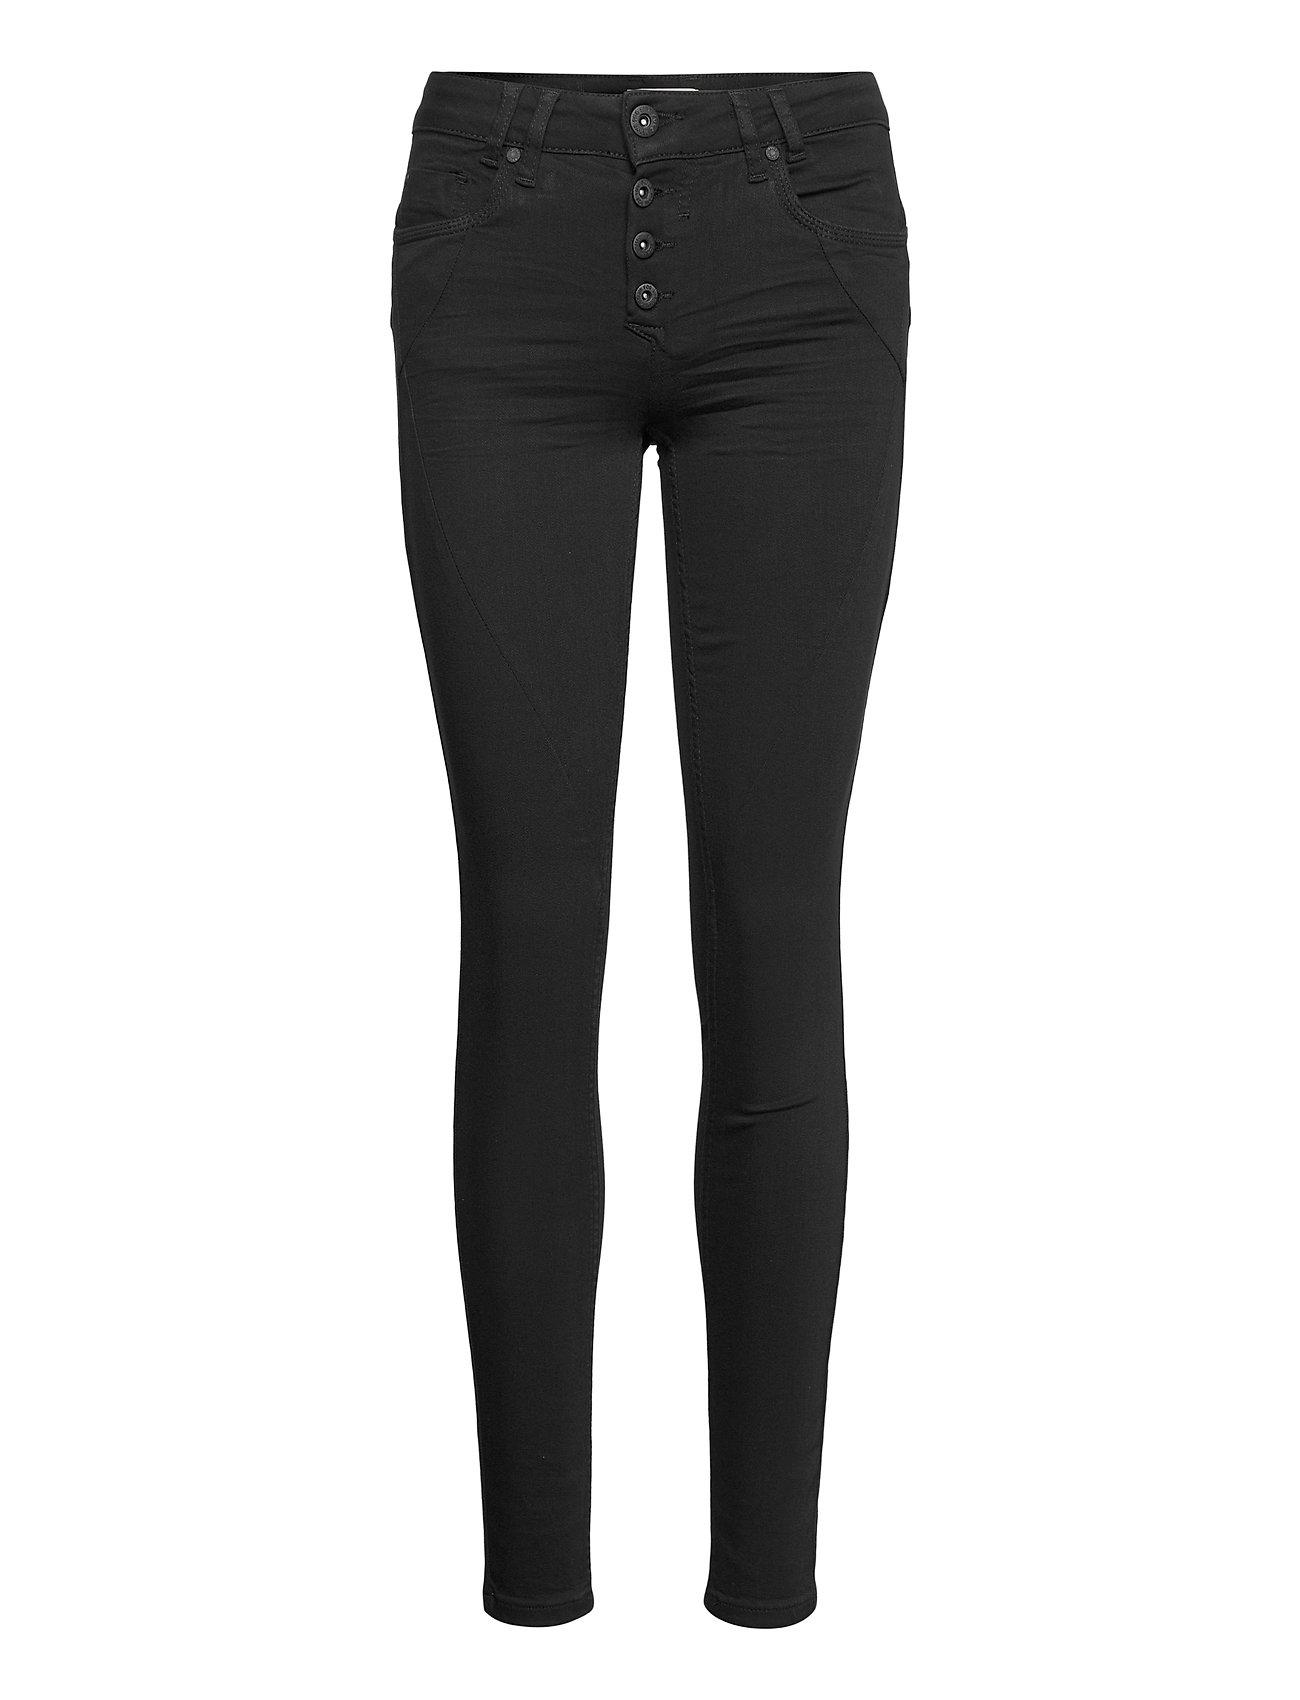 Image of Pzanna Jeans Skinny Leg Stay Black Skinny Jeans Sort Pulz Jeans (3452210751)